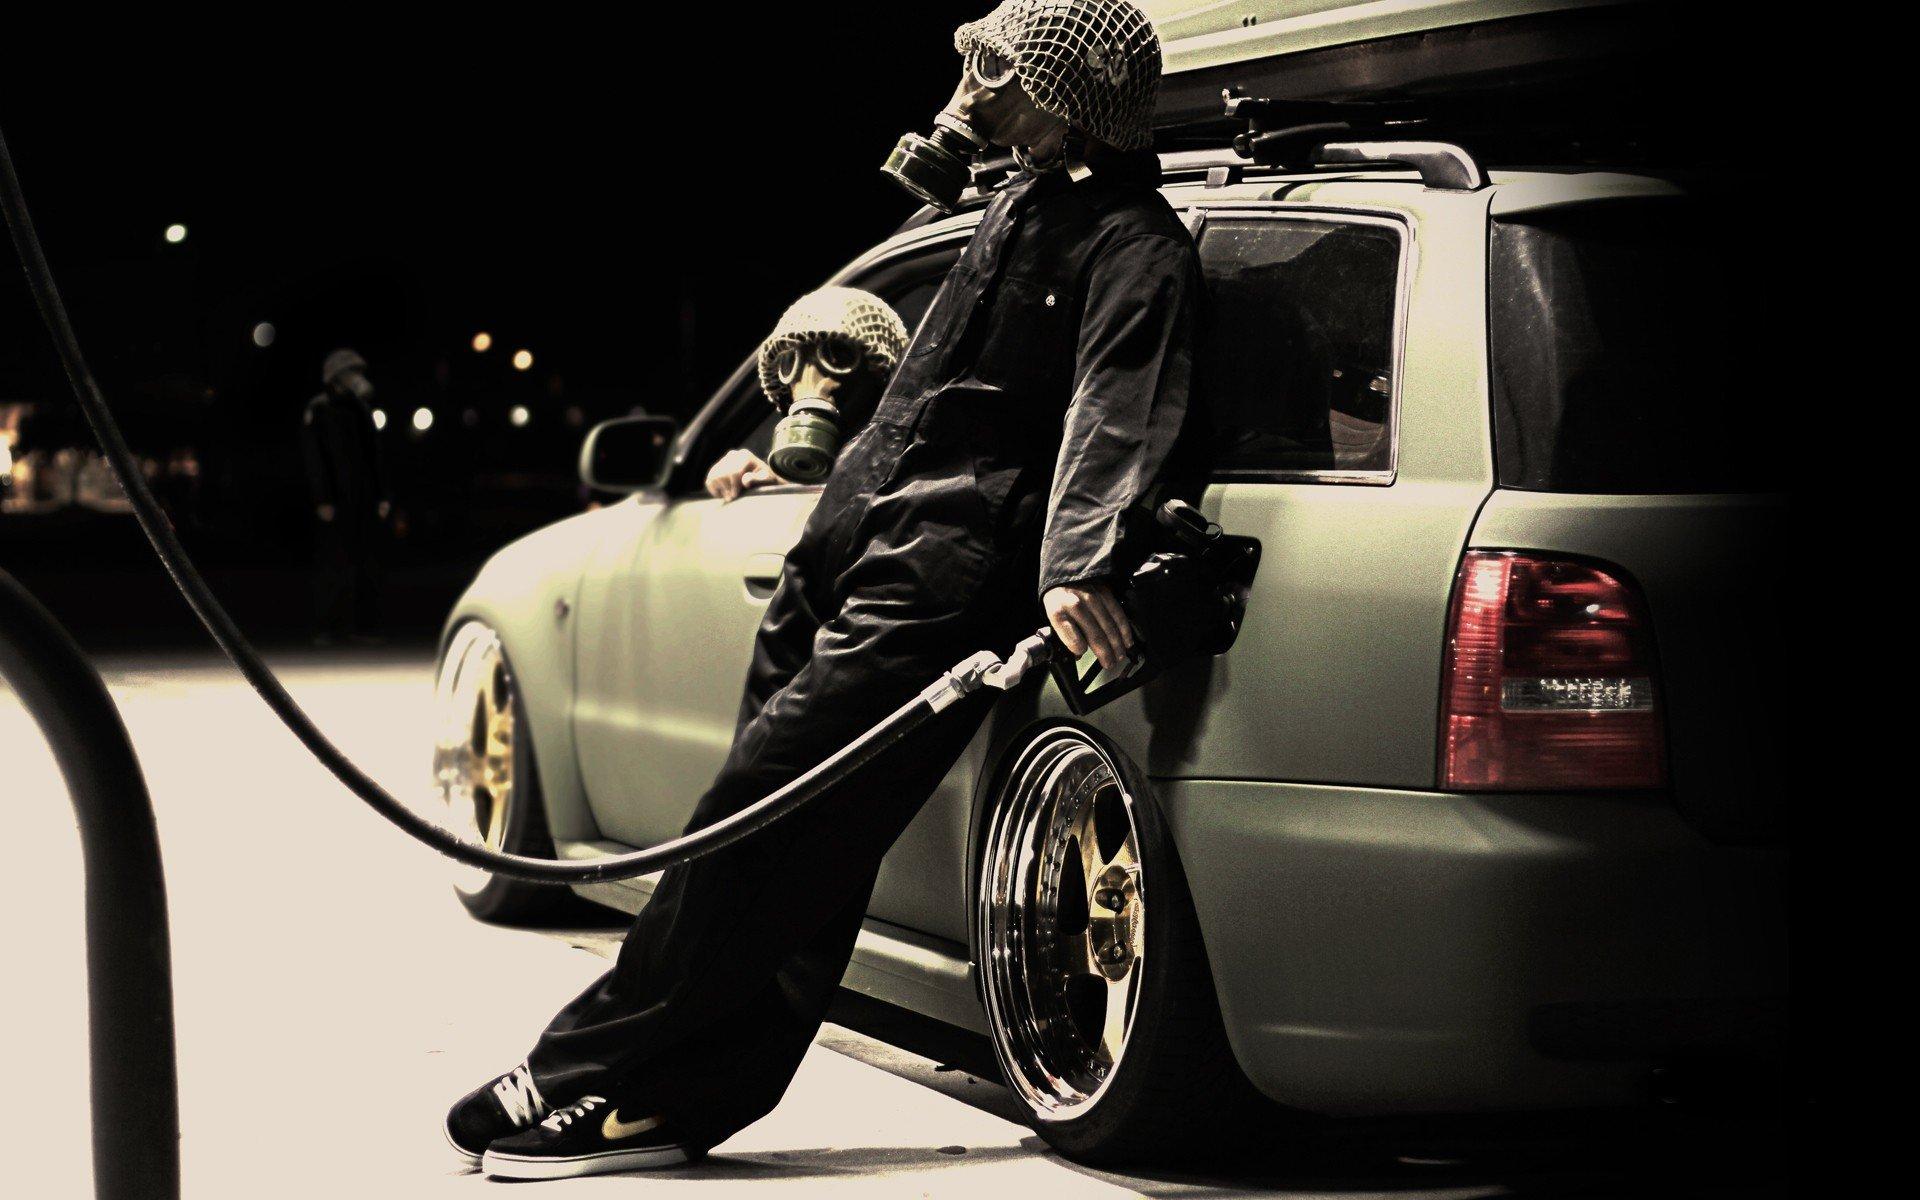 sports car, Gas stations, Mafia, Car, Gas masks Wallpaper